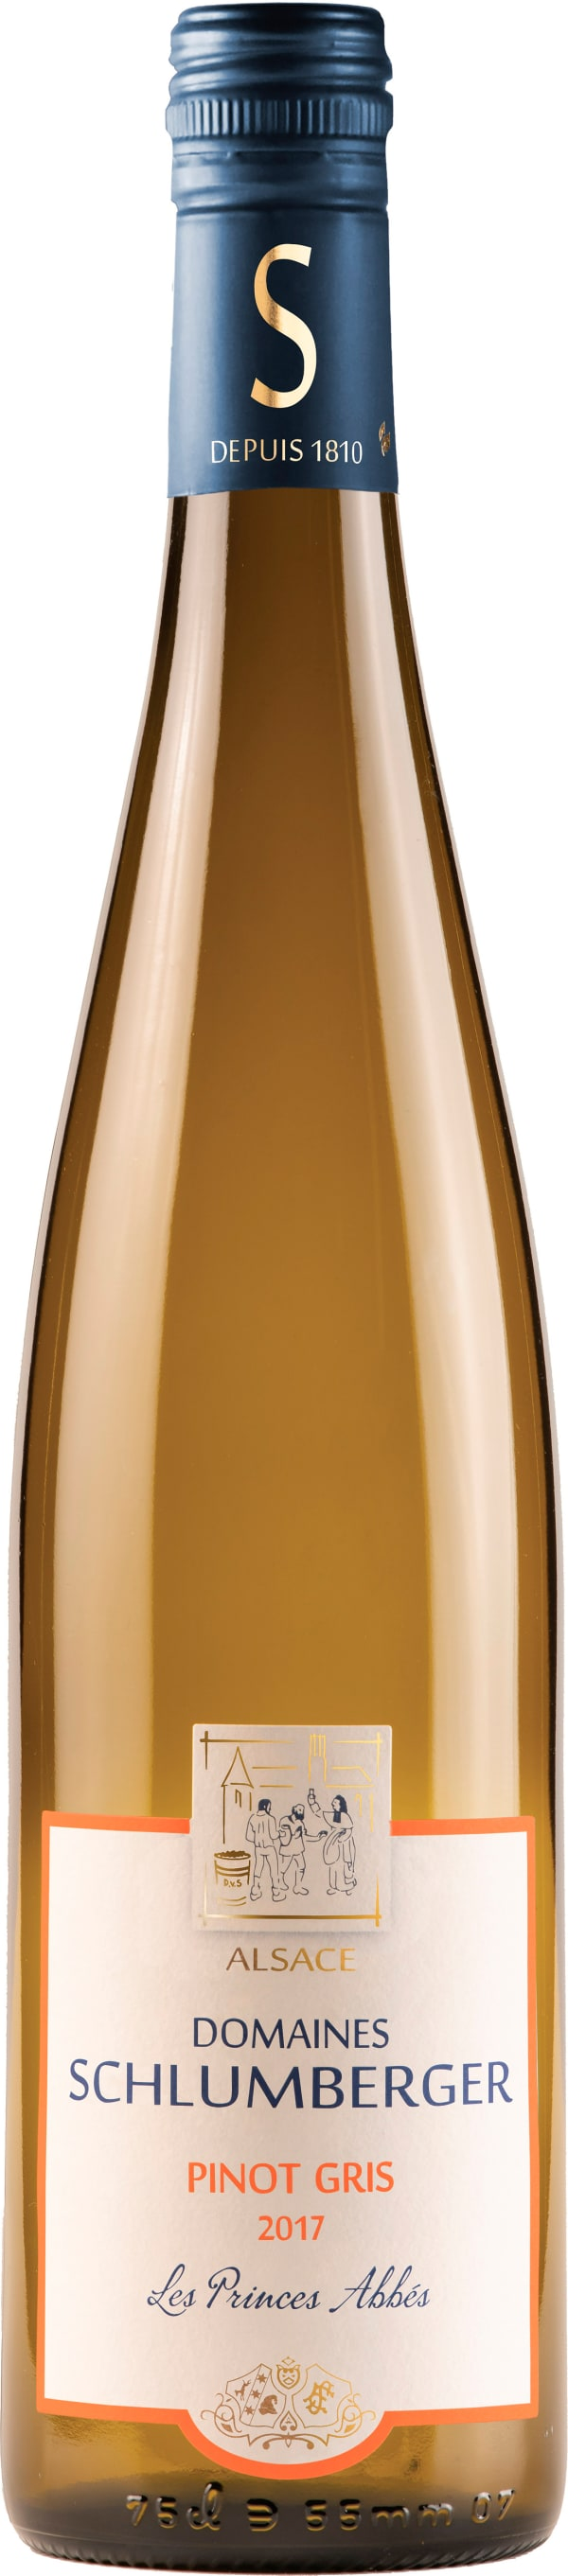 Domaines Schlumberger Pinot Gris Les Princes Abbés 2015